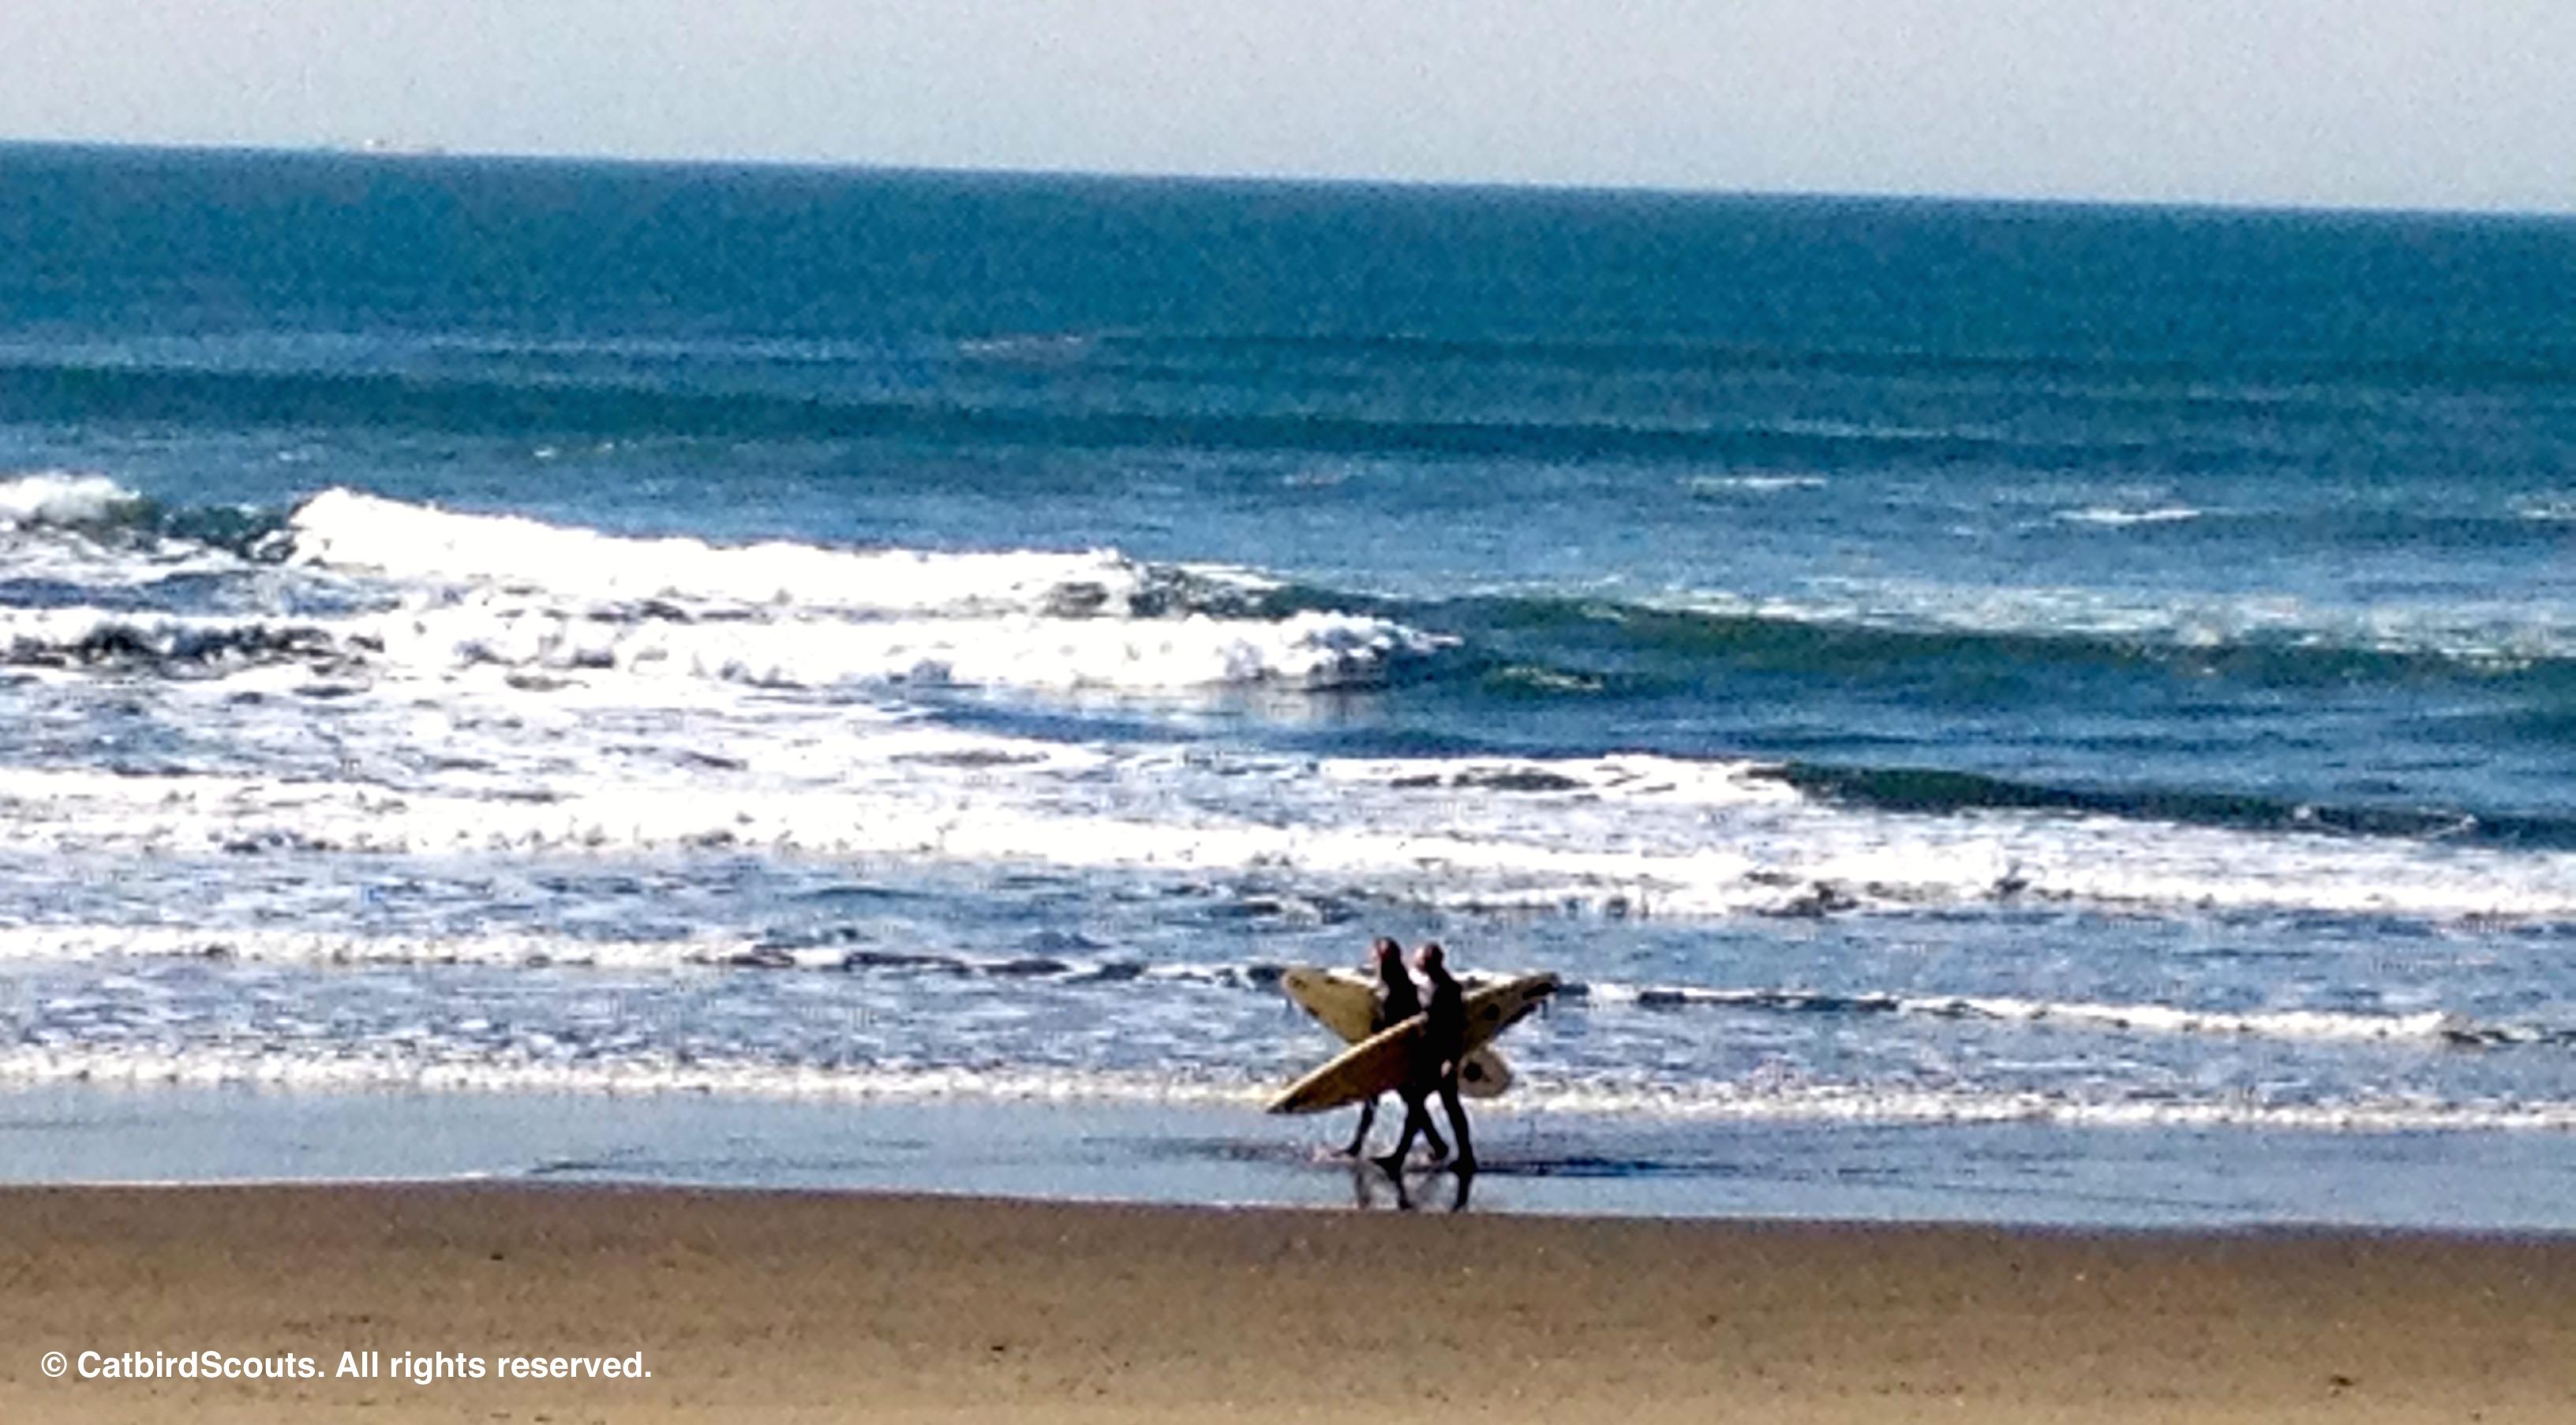 Surfers-Catbird-Scouts